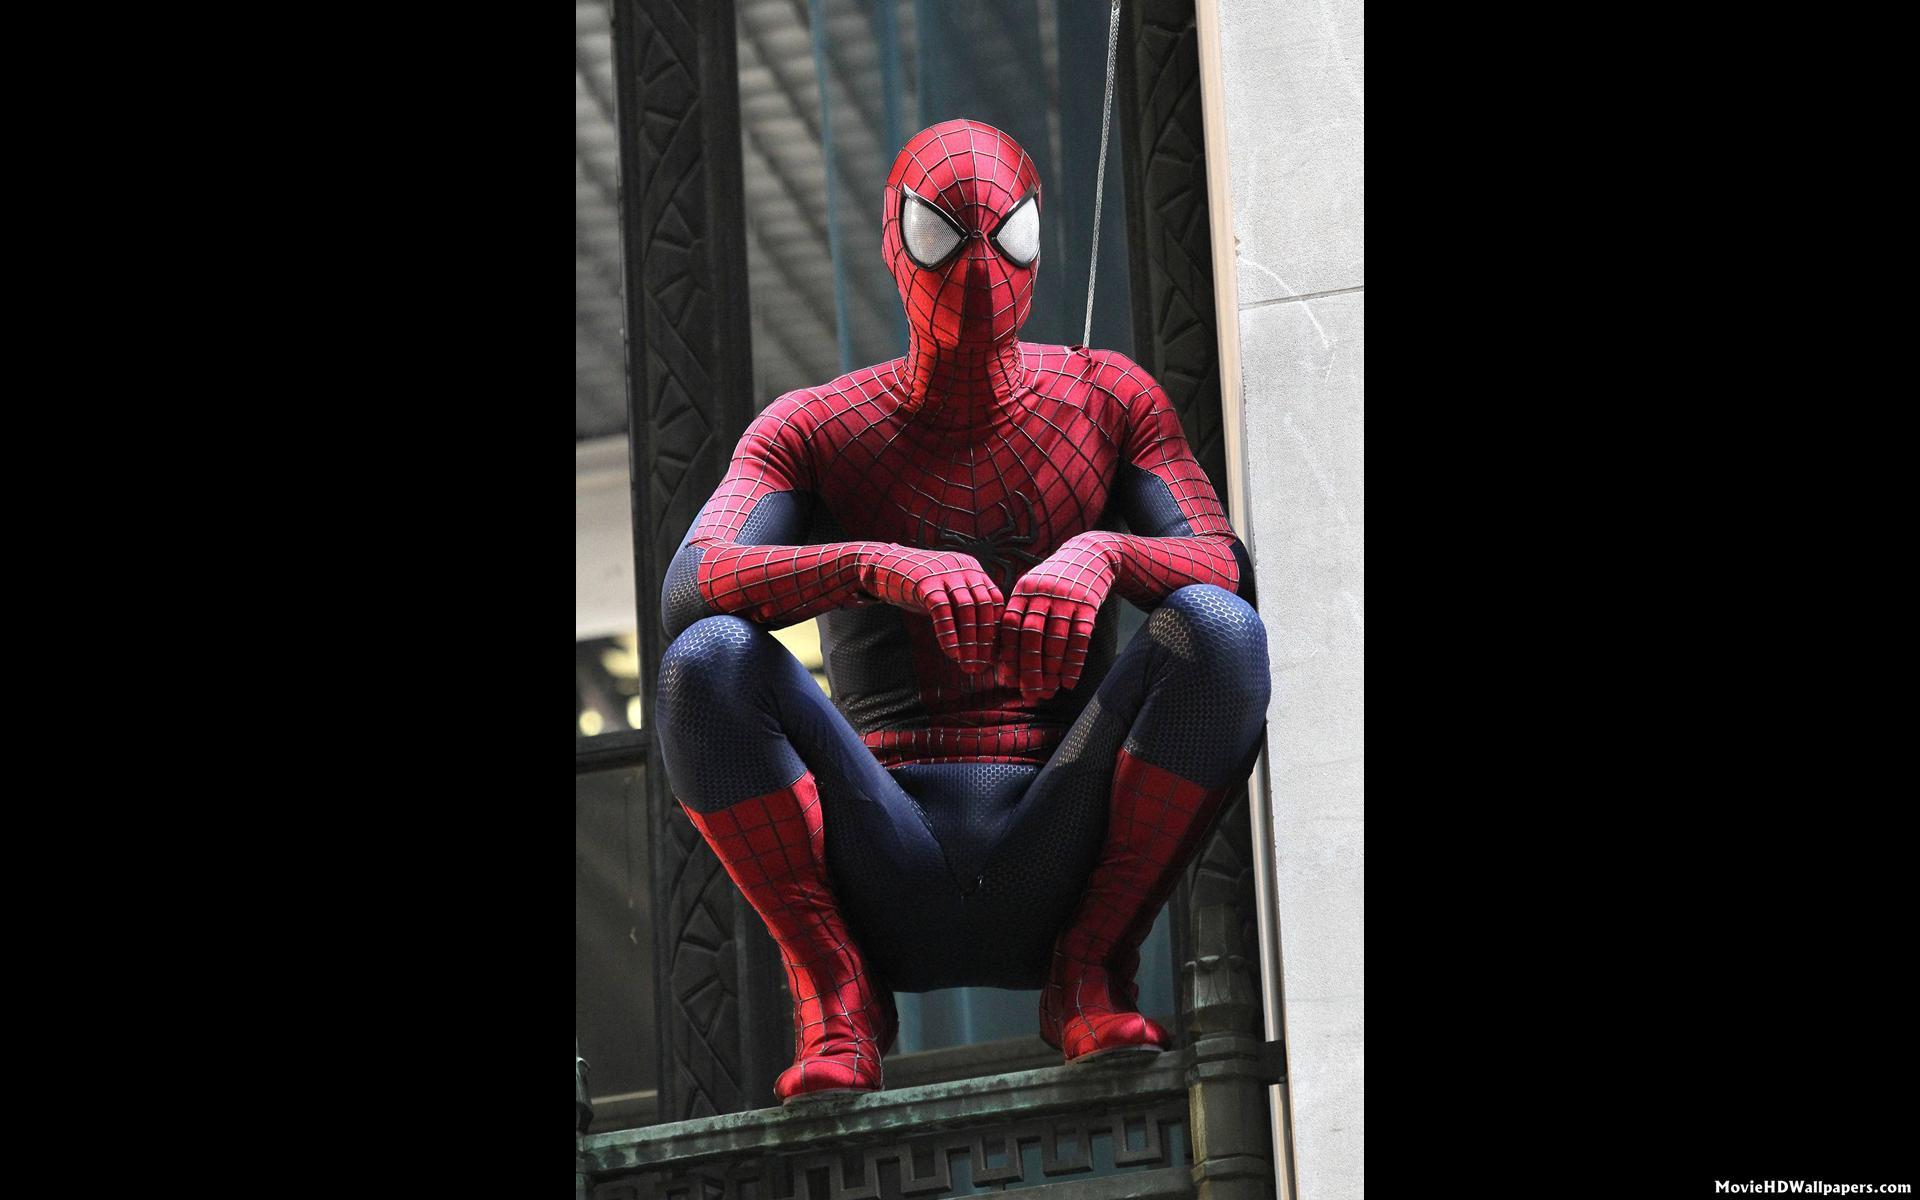 Image-The-Amazing-SpiderMan-Live-Amazing-wallpaper-wpc5806289